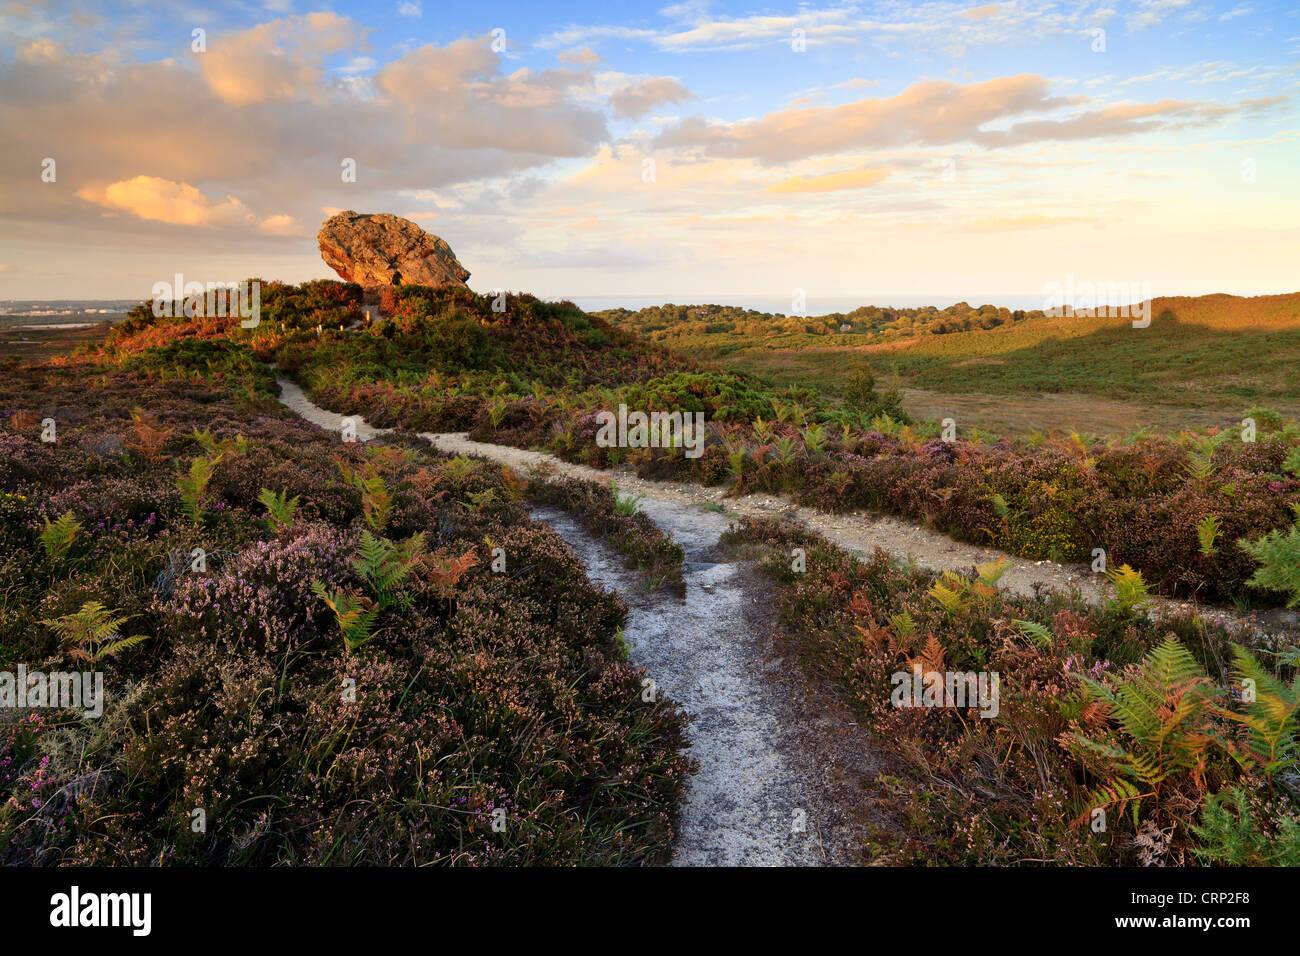 Evening light at Agglestone Rock, a large sandstone rock on Studland Heath. - Stock Image